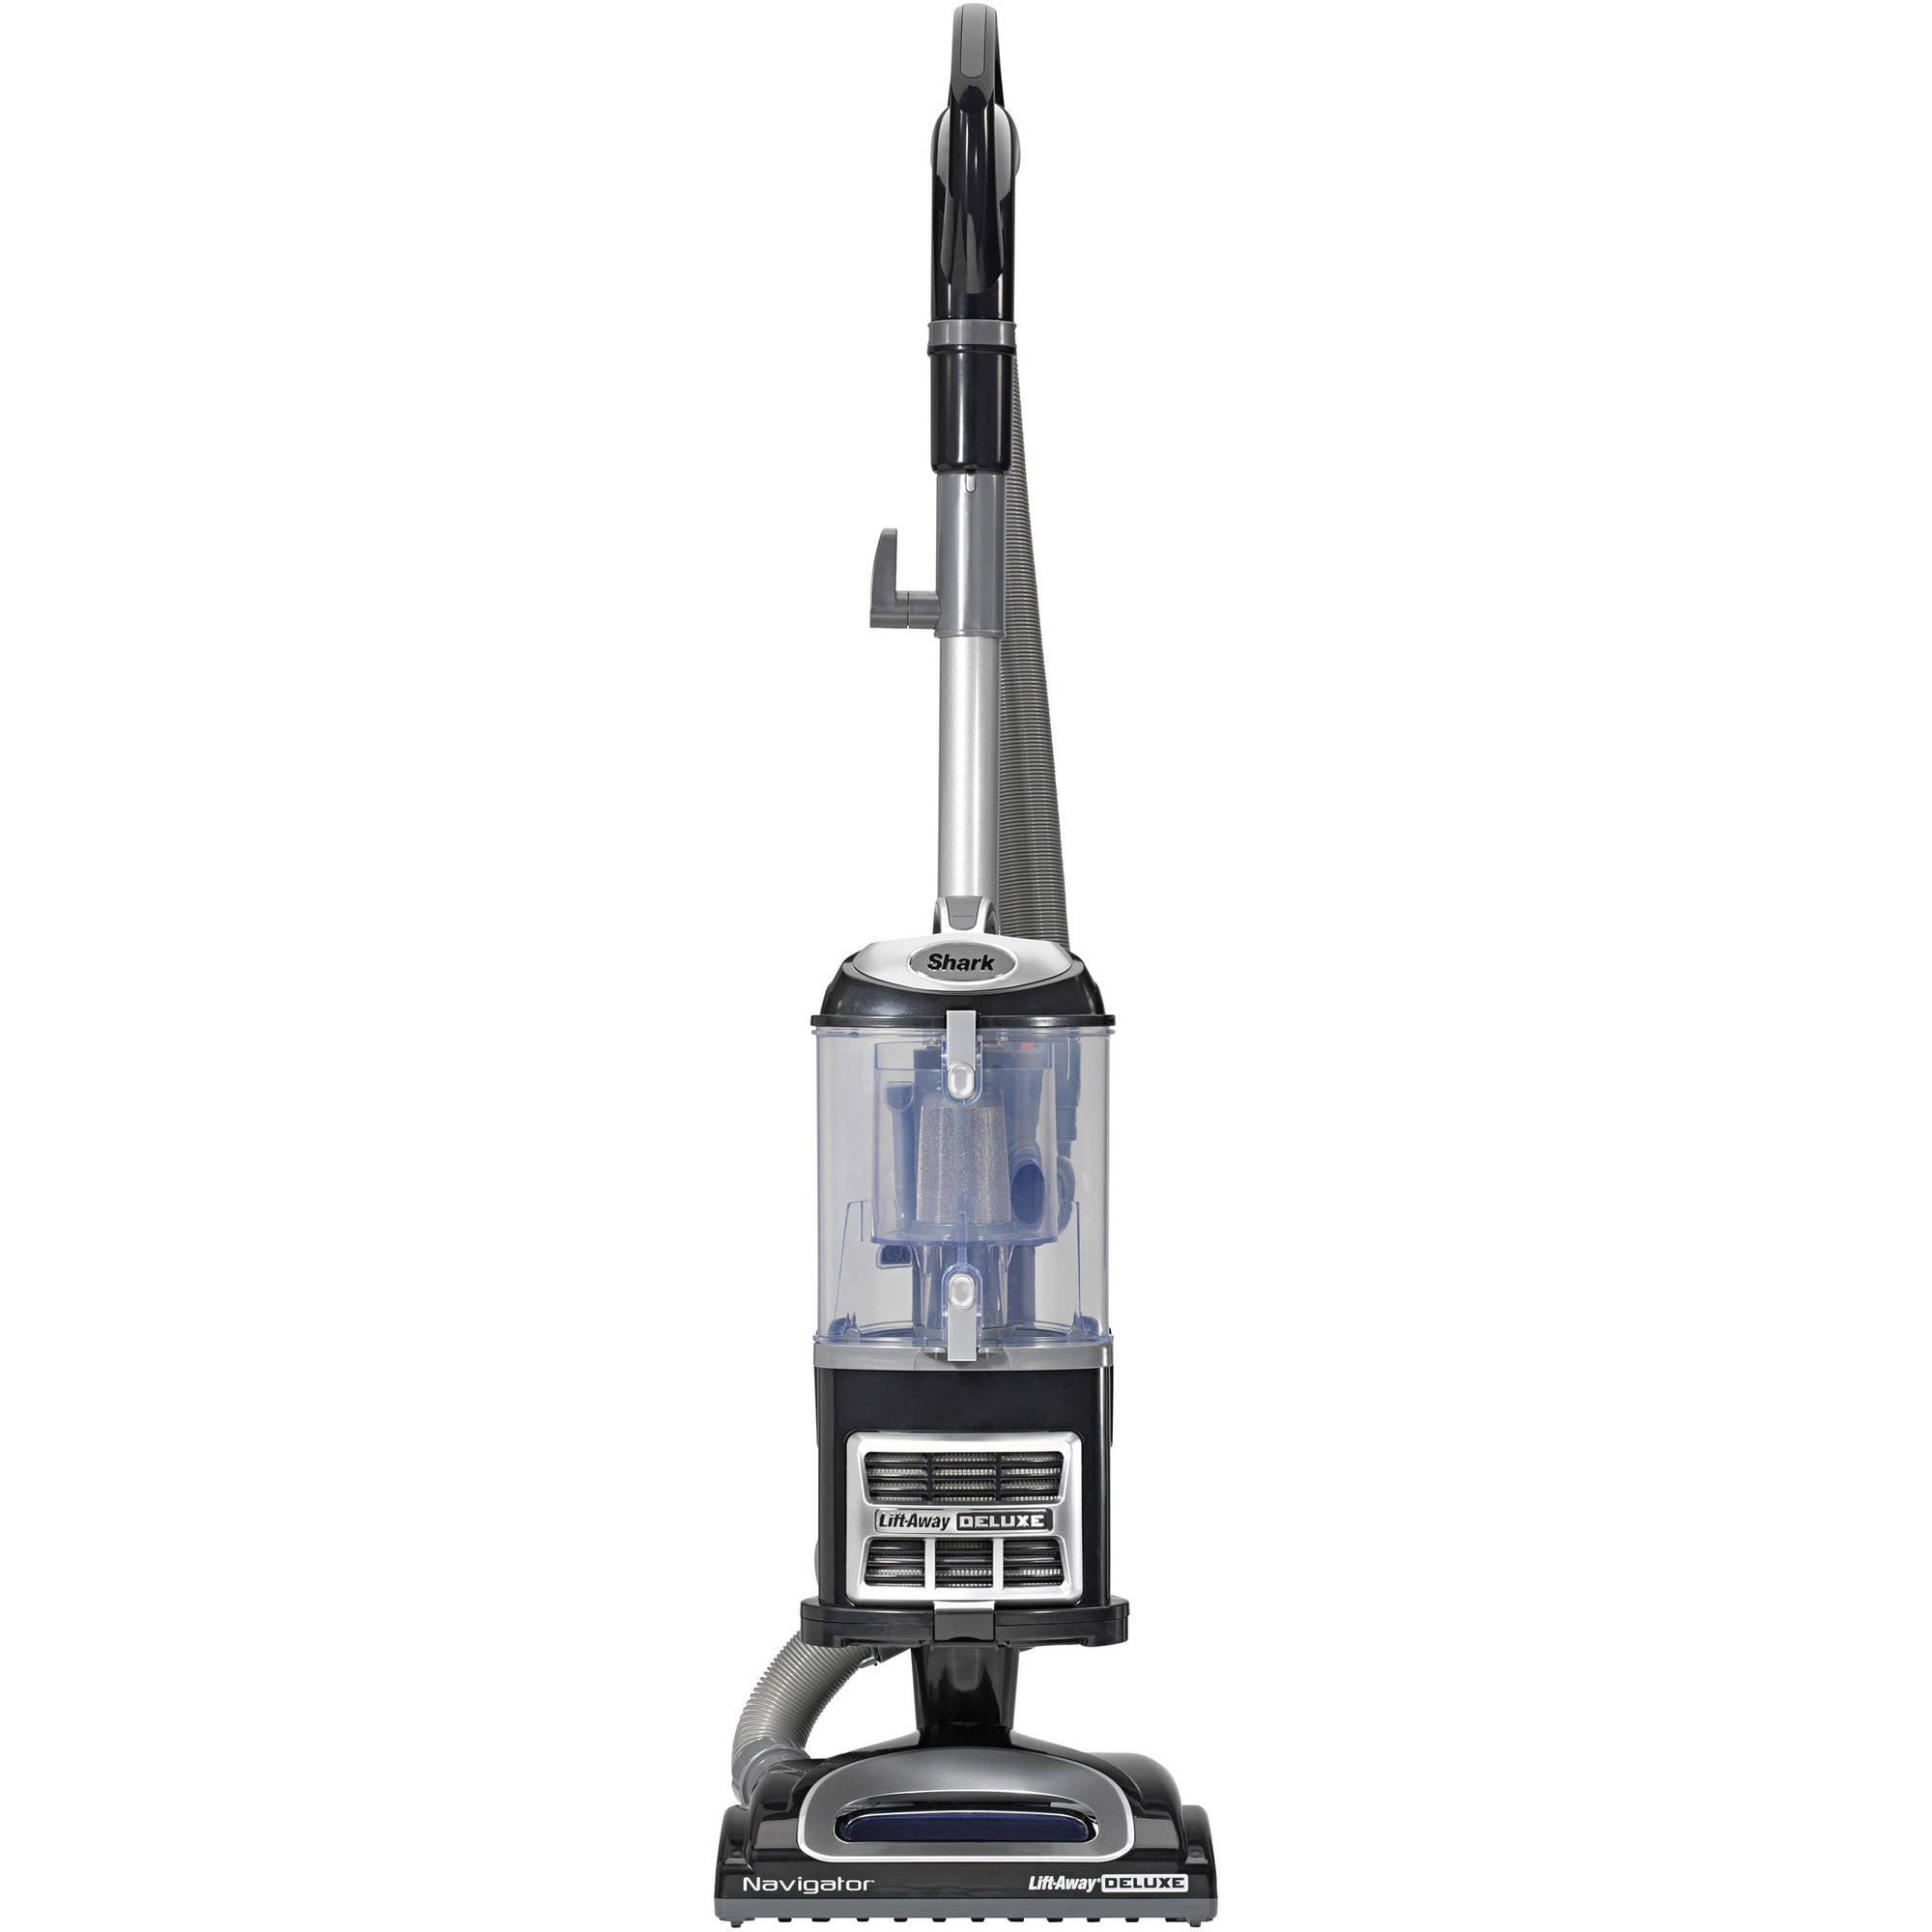 Shark navigator vacuum cleaner big w - Shark Navigator Lift Away Deluxe Upright Vacuum With Appliance Wand Black Nv361bk Walmart Com